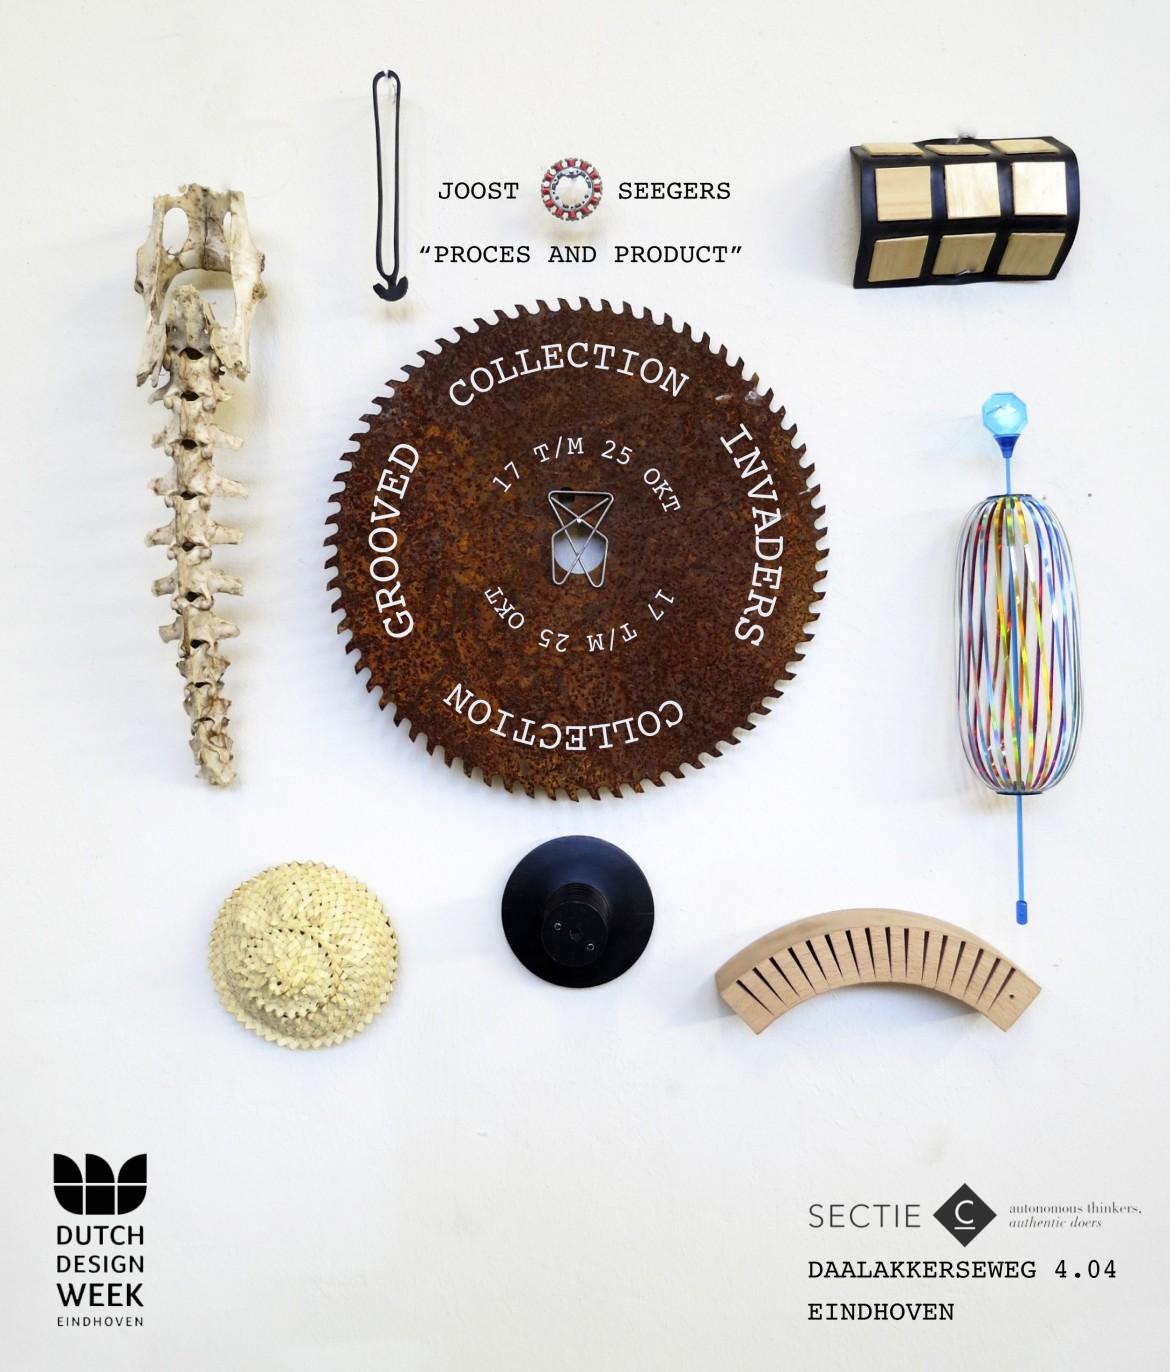 Presentation of new work at the Dutch Design Week 2015